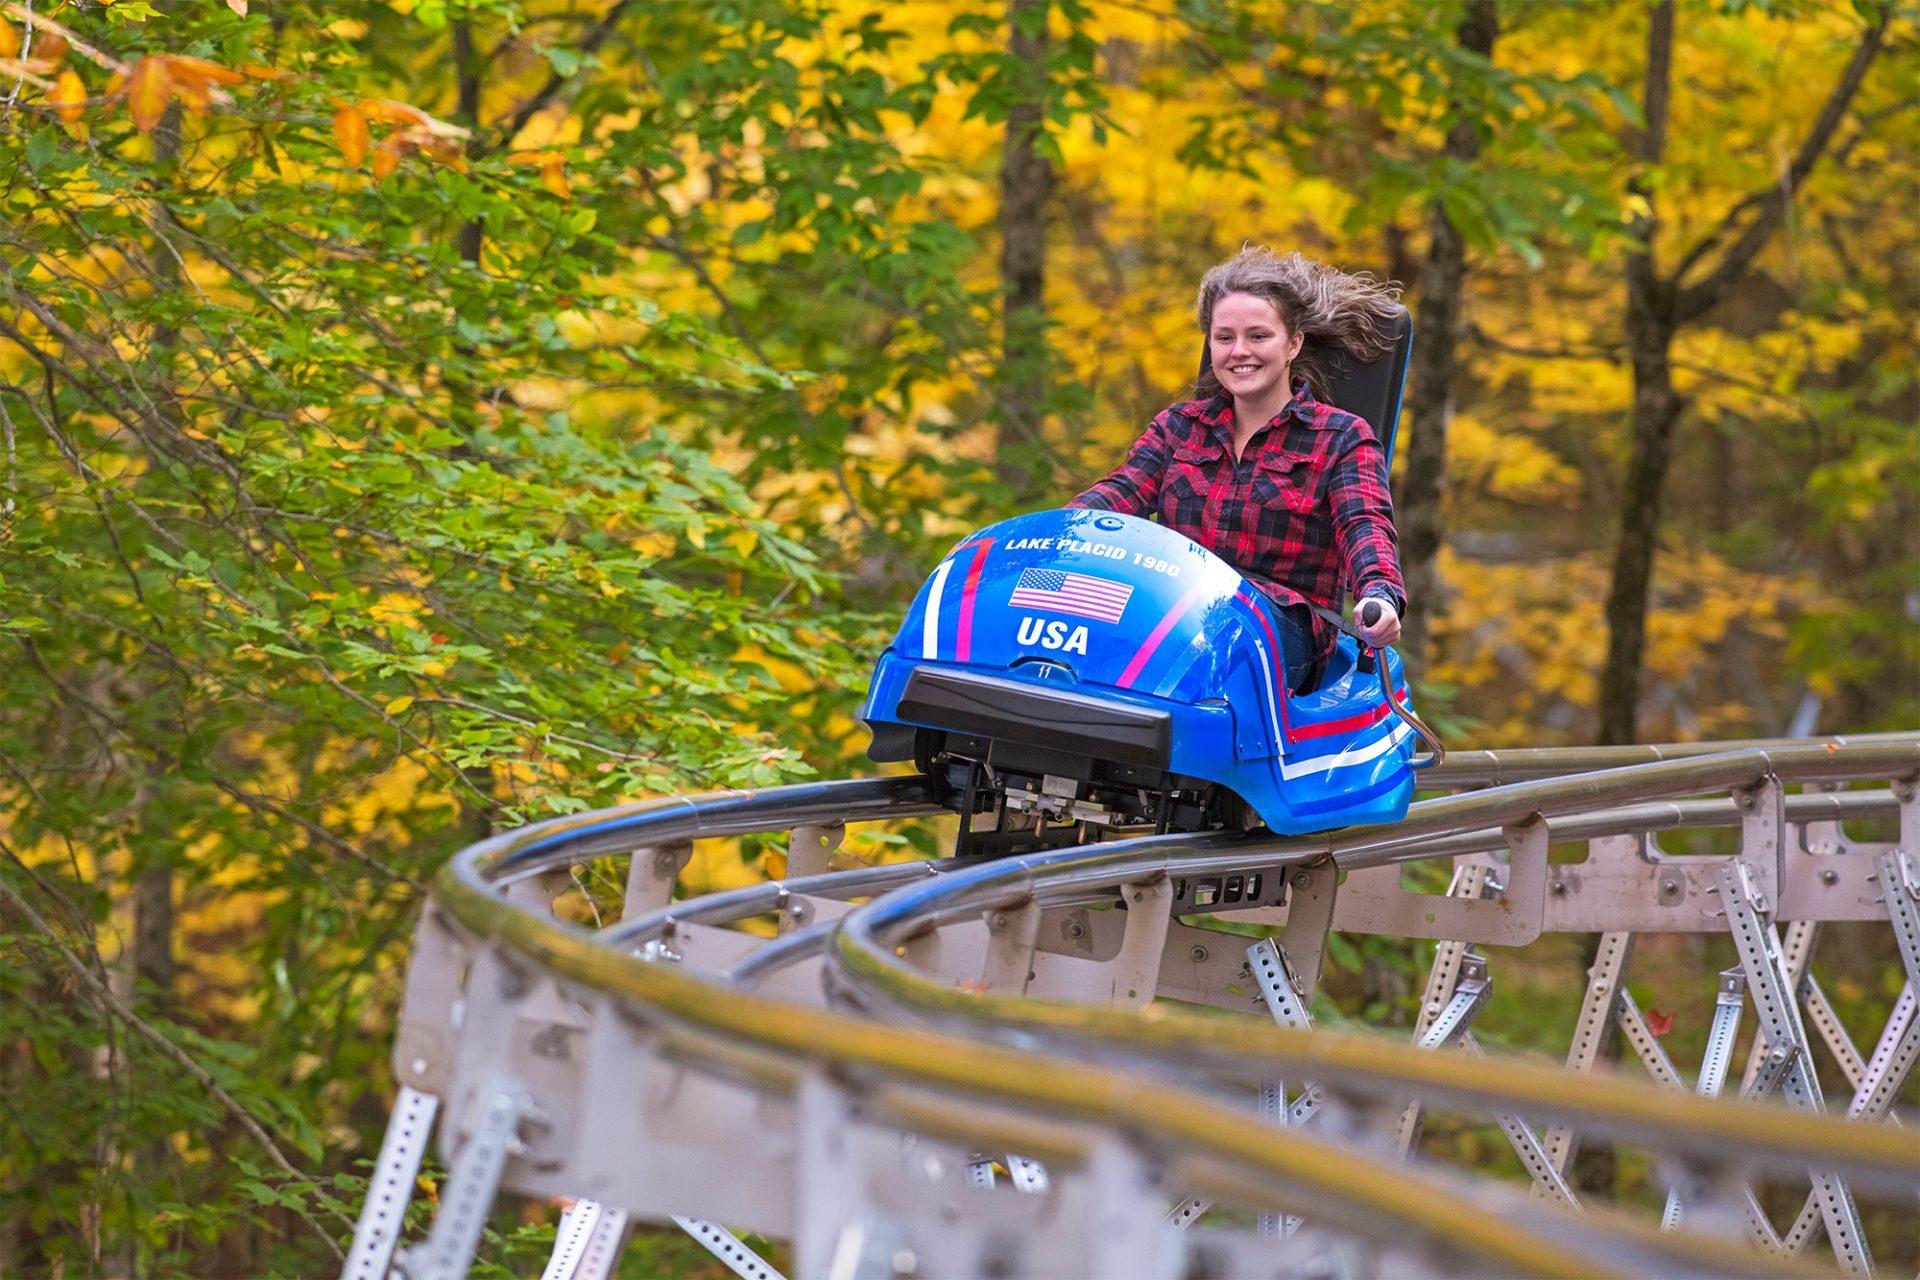 girl on mountain coaster track at orda lake placid